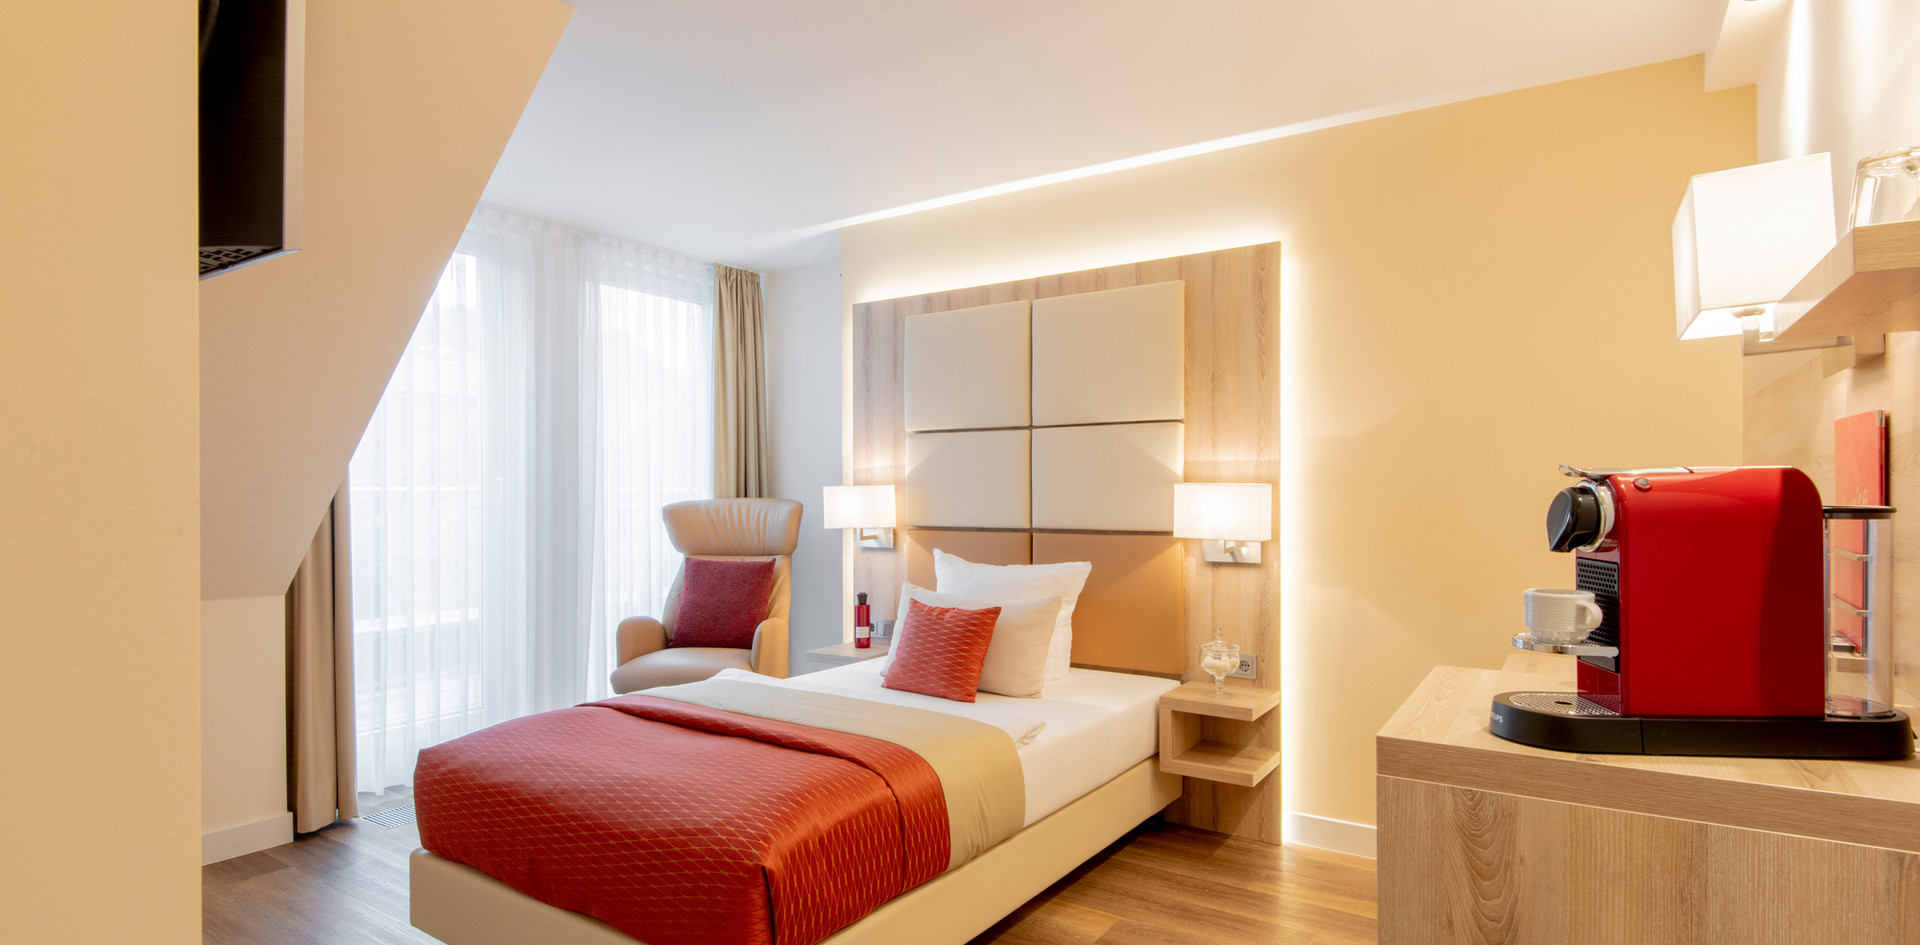 Einzelzimmer Villa2 EZ Villa 2 Hotel Wegner - The culinary Art Hotel